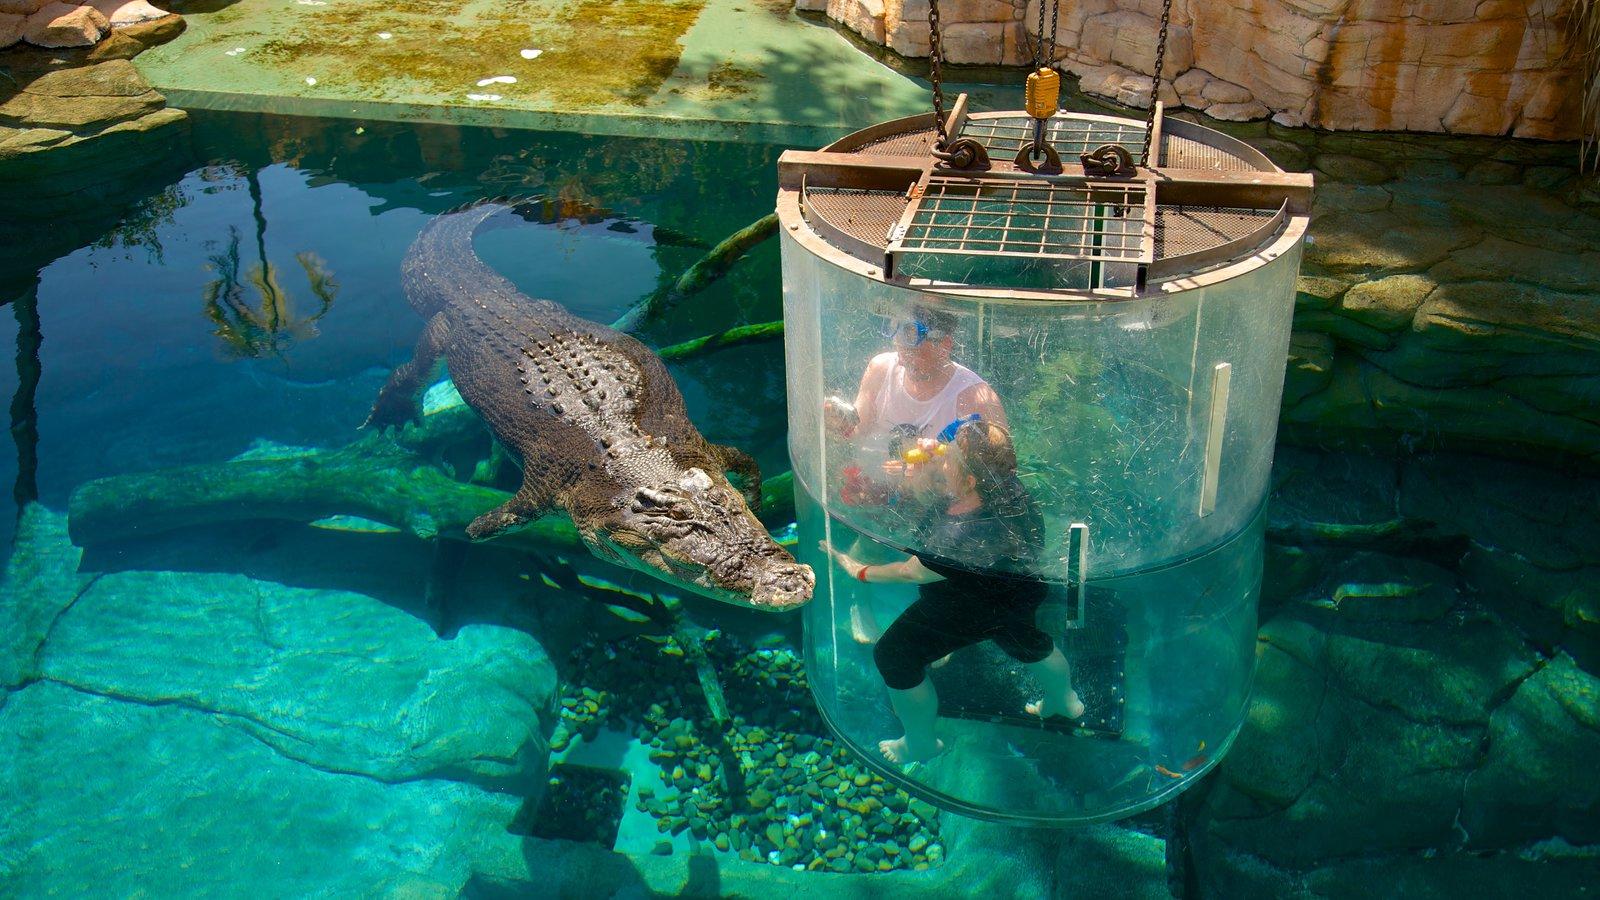 Crocosaurus Cove showing dangerous animals and zoo animals